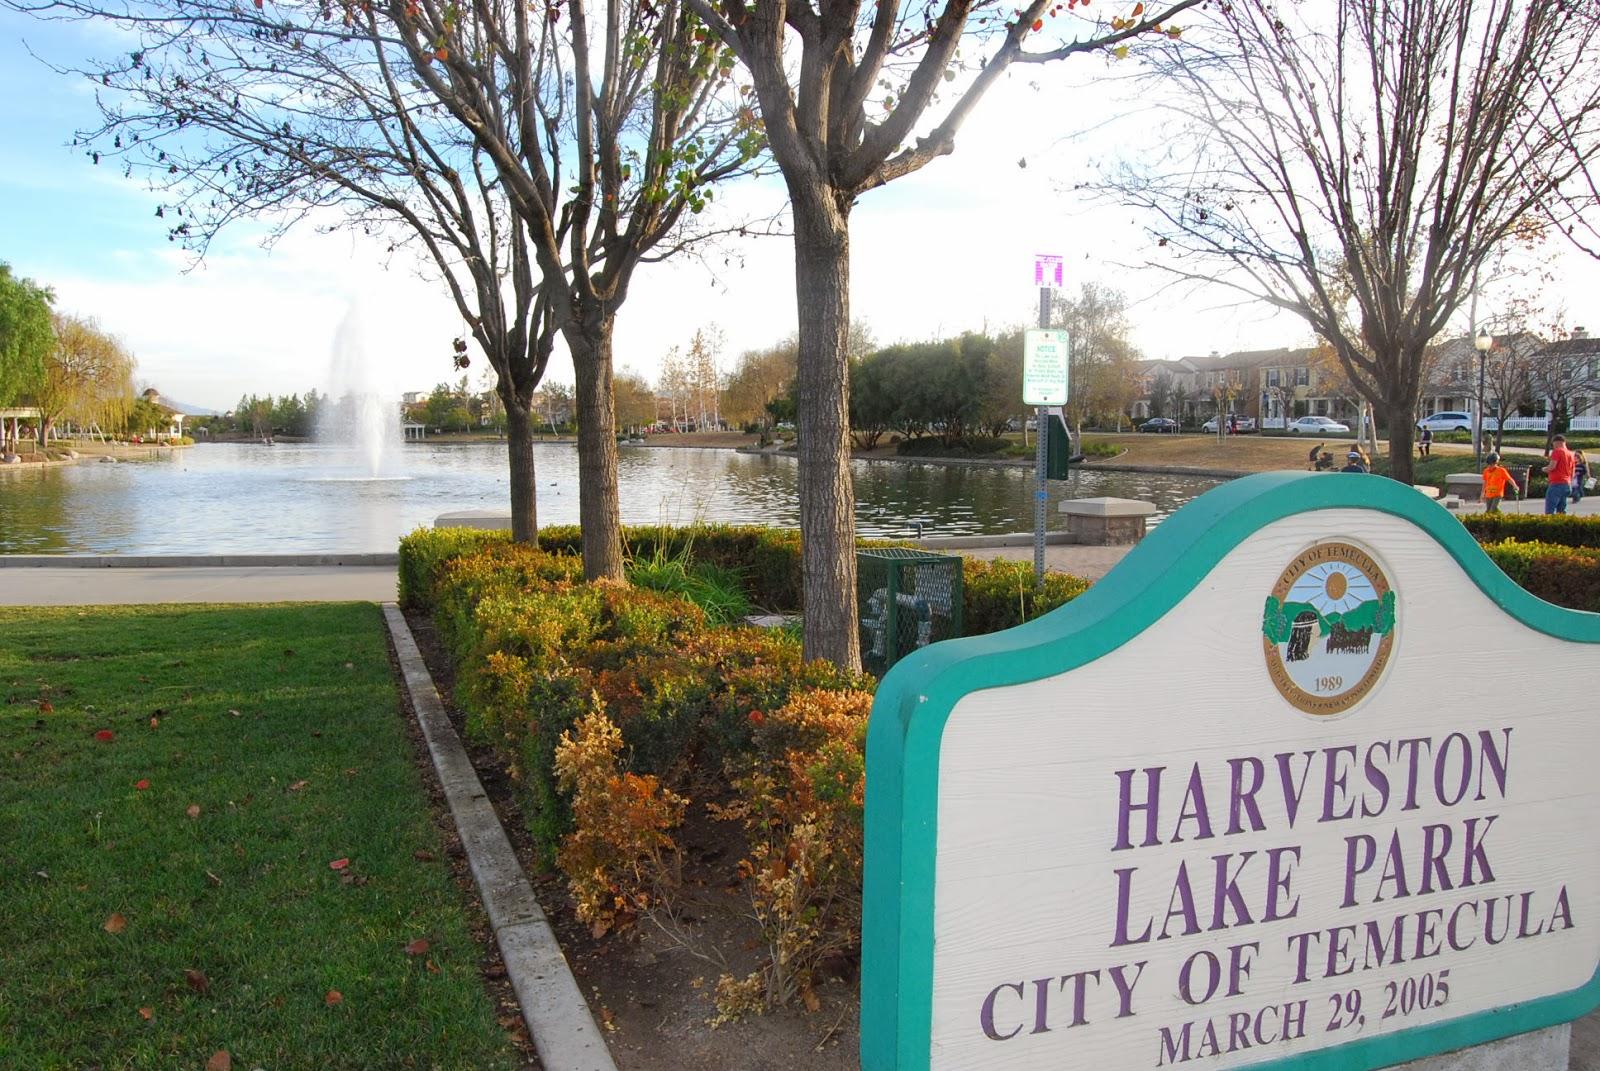 Harveston Lake {temecula}